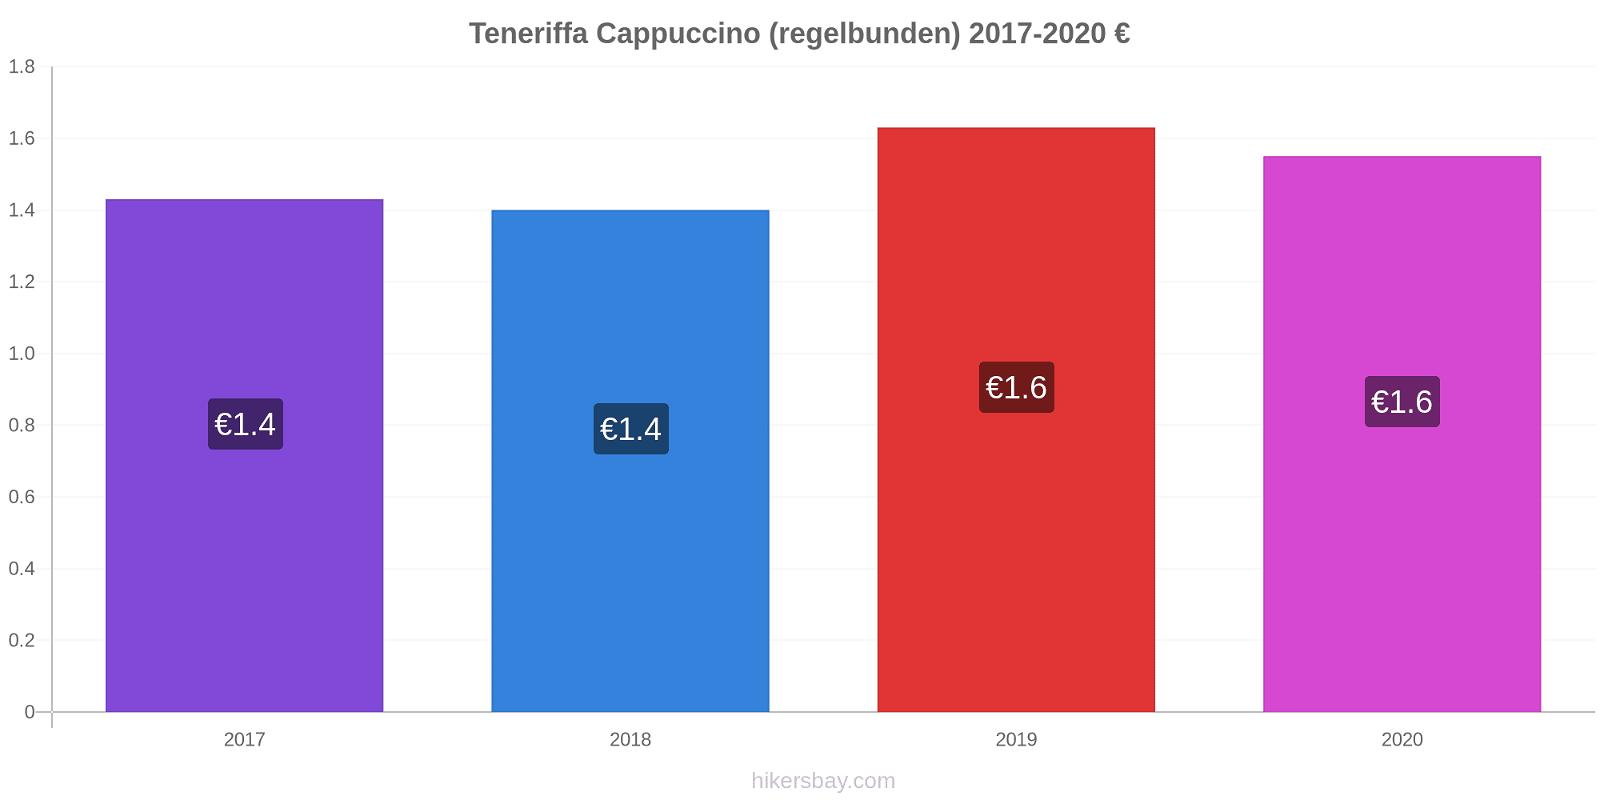 Teneriffa prisförändringar Cappuccino (regelbunden) hikersbay.com